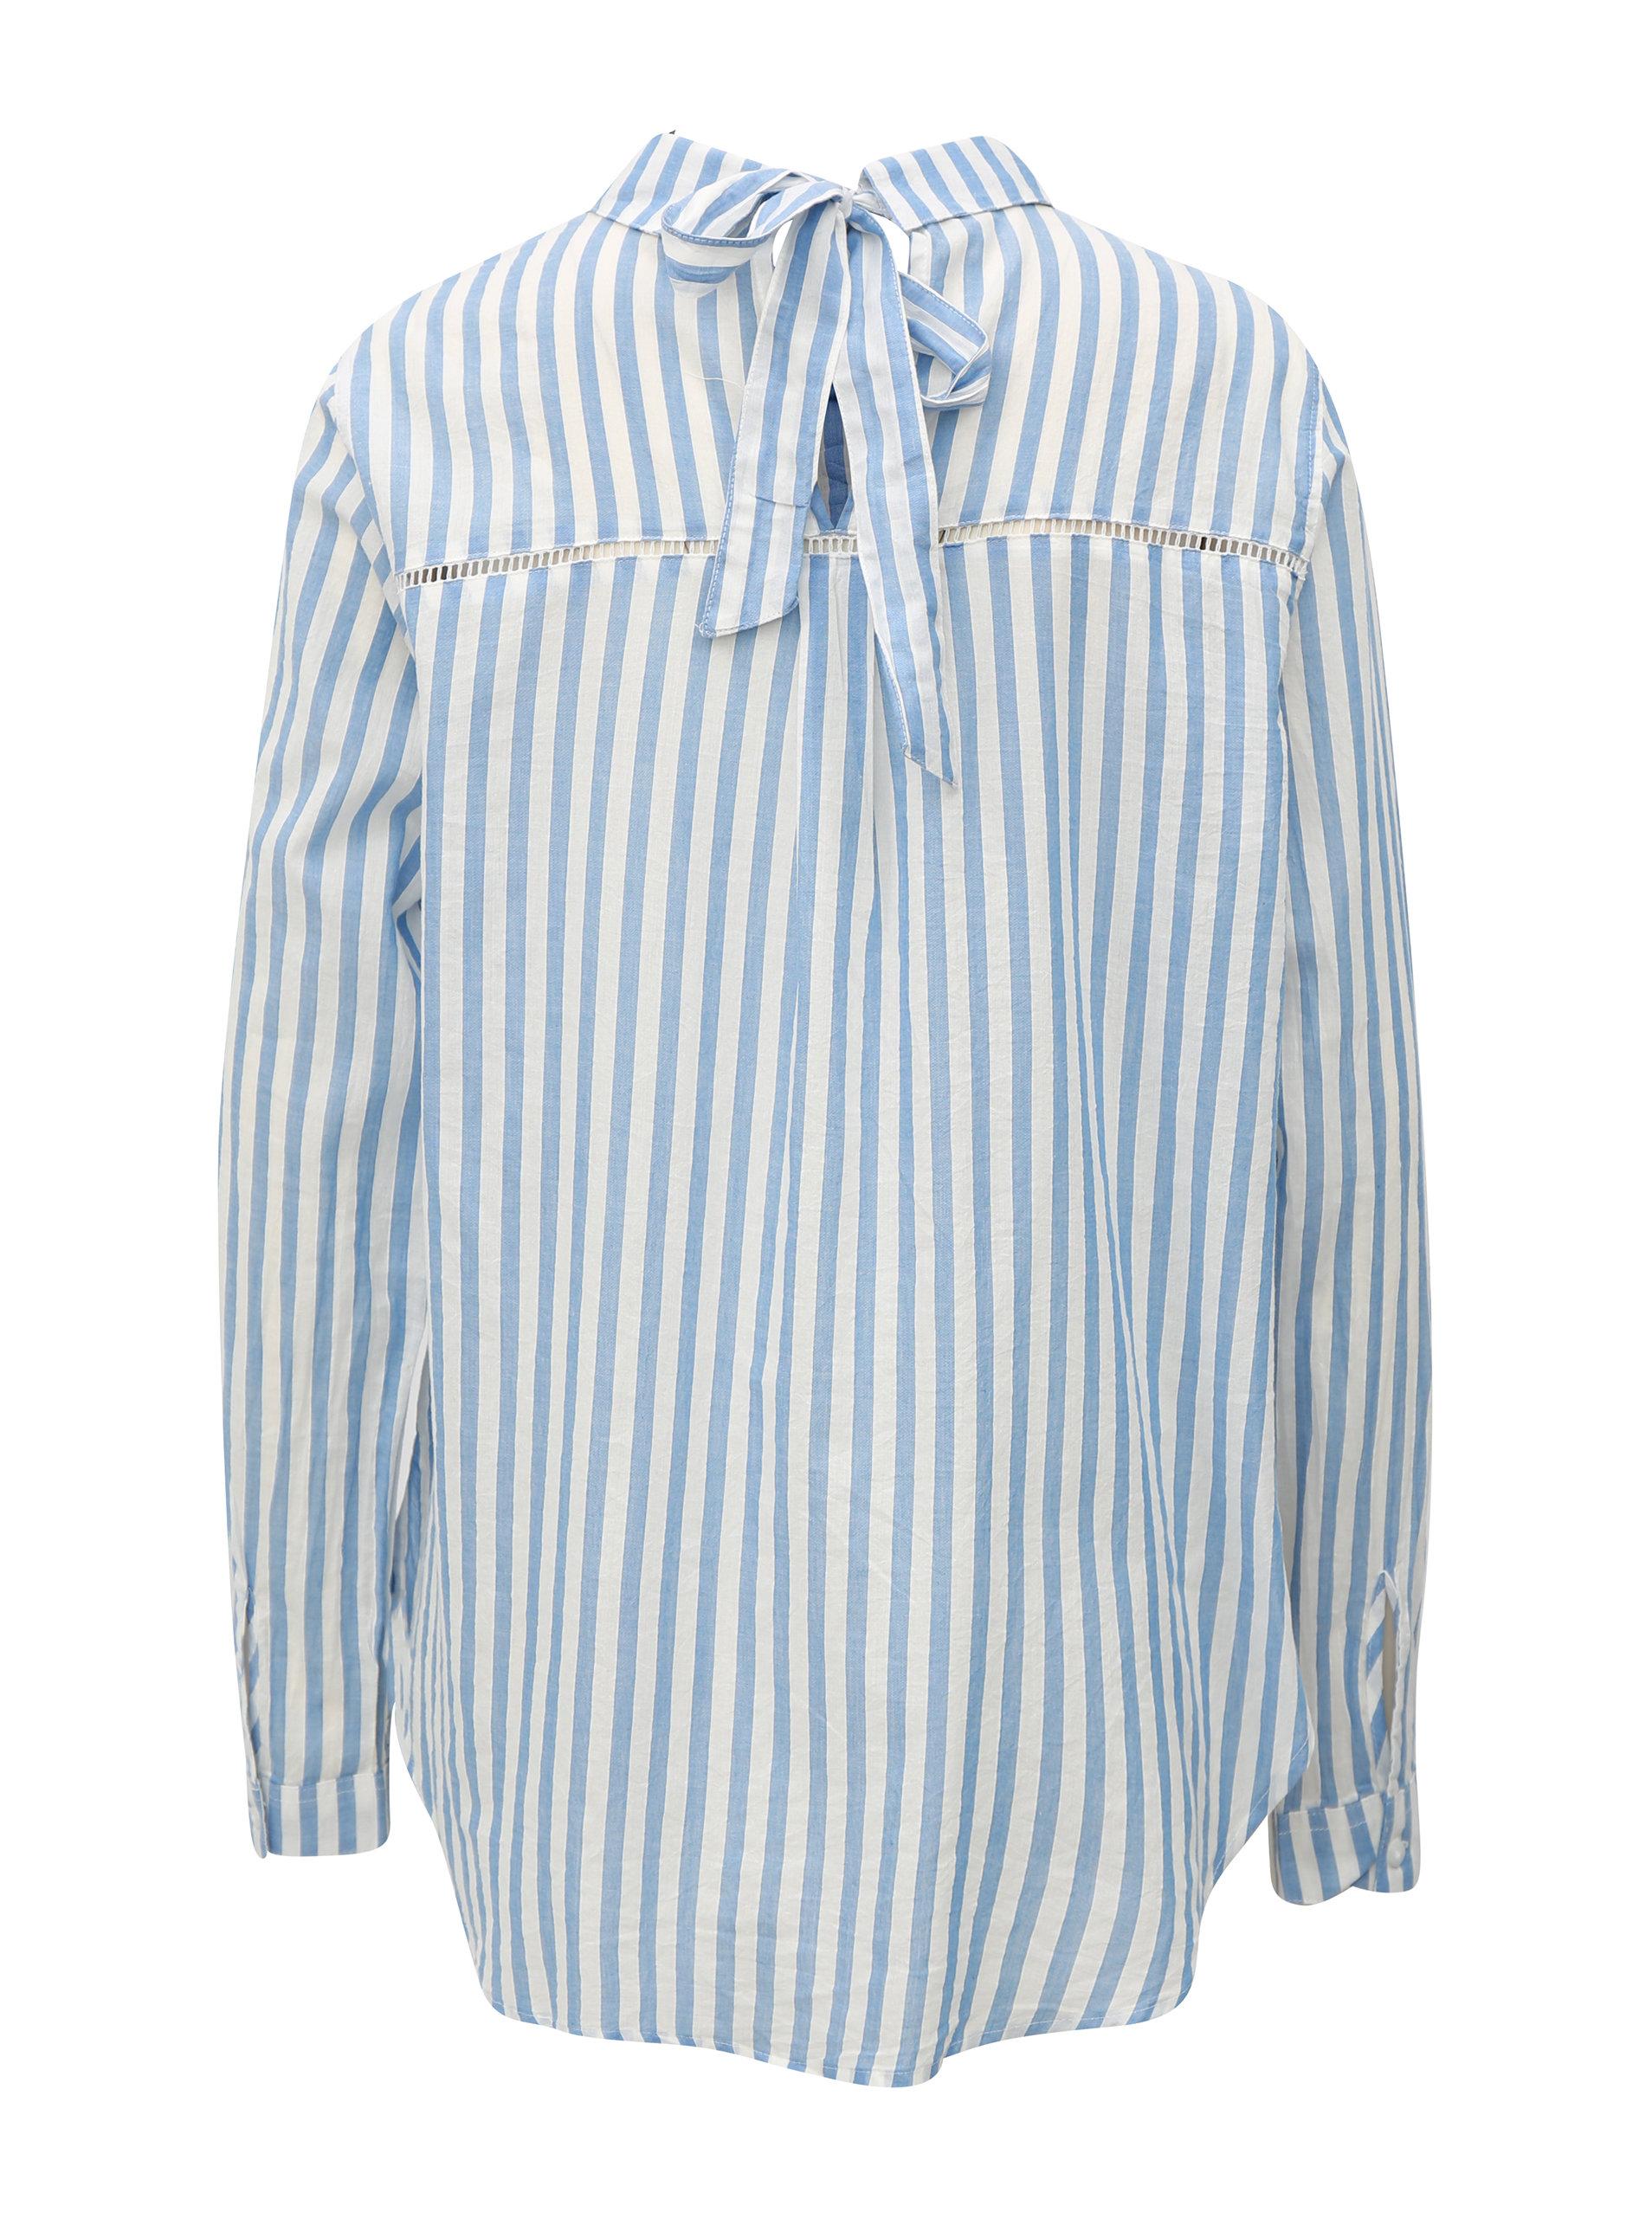 6595e28551c6 Bielo-modrá dámska košeľa s mašľou Broadway Dayna ...